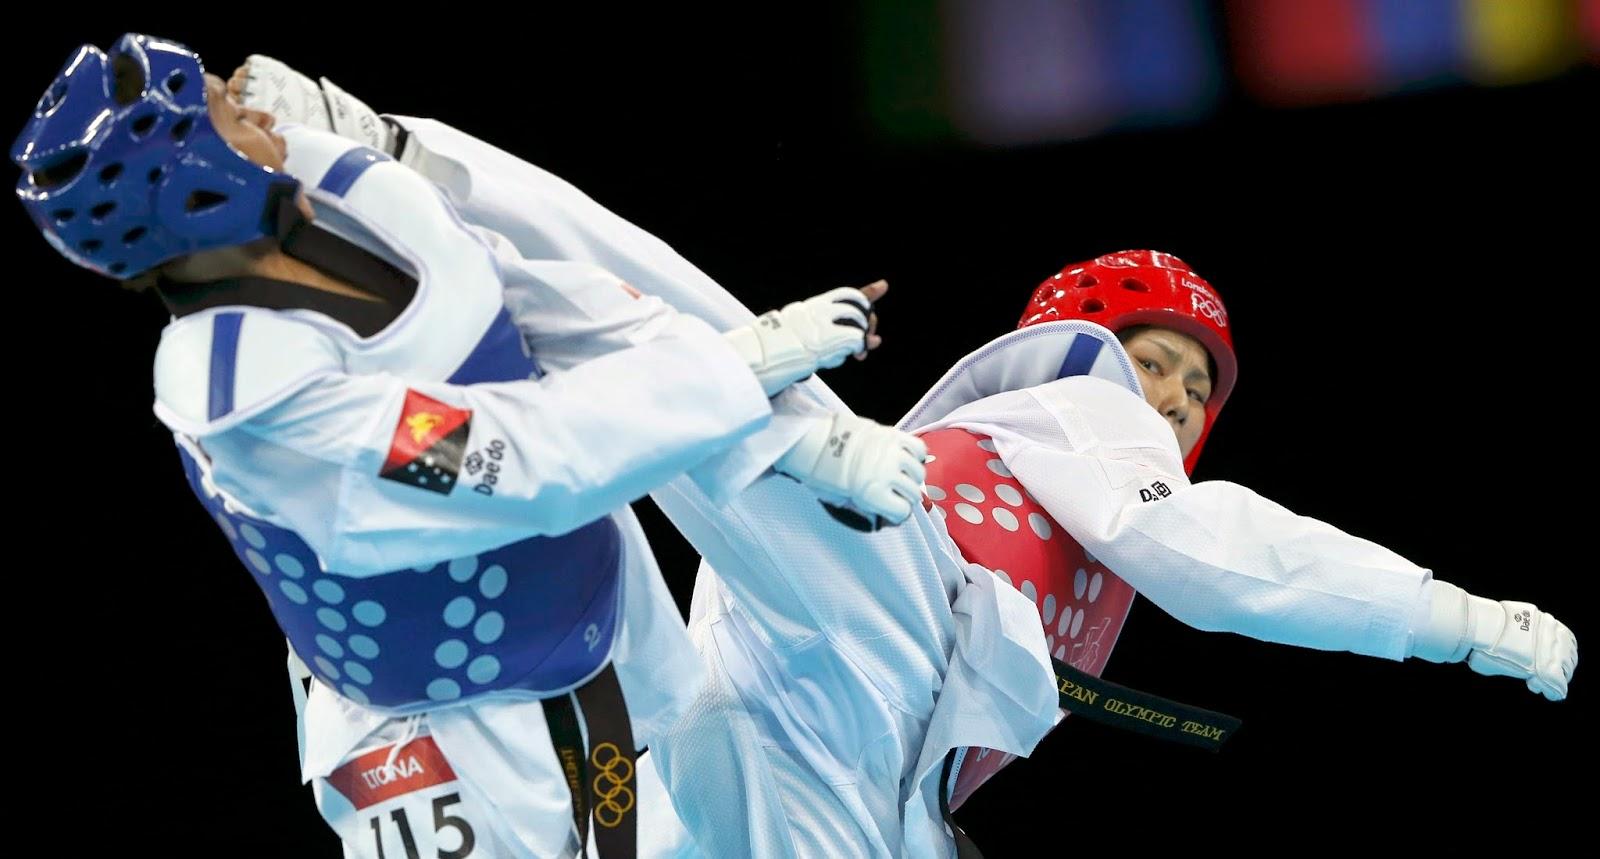 taekwondo-08